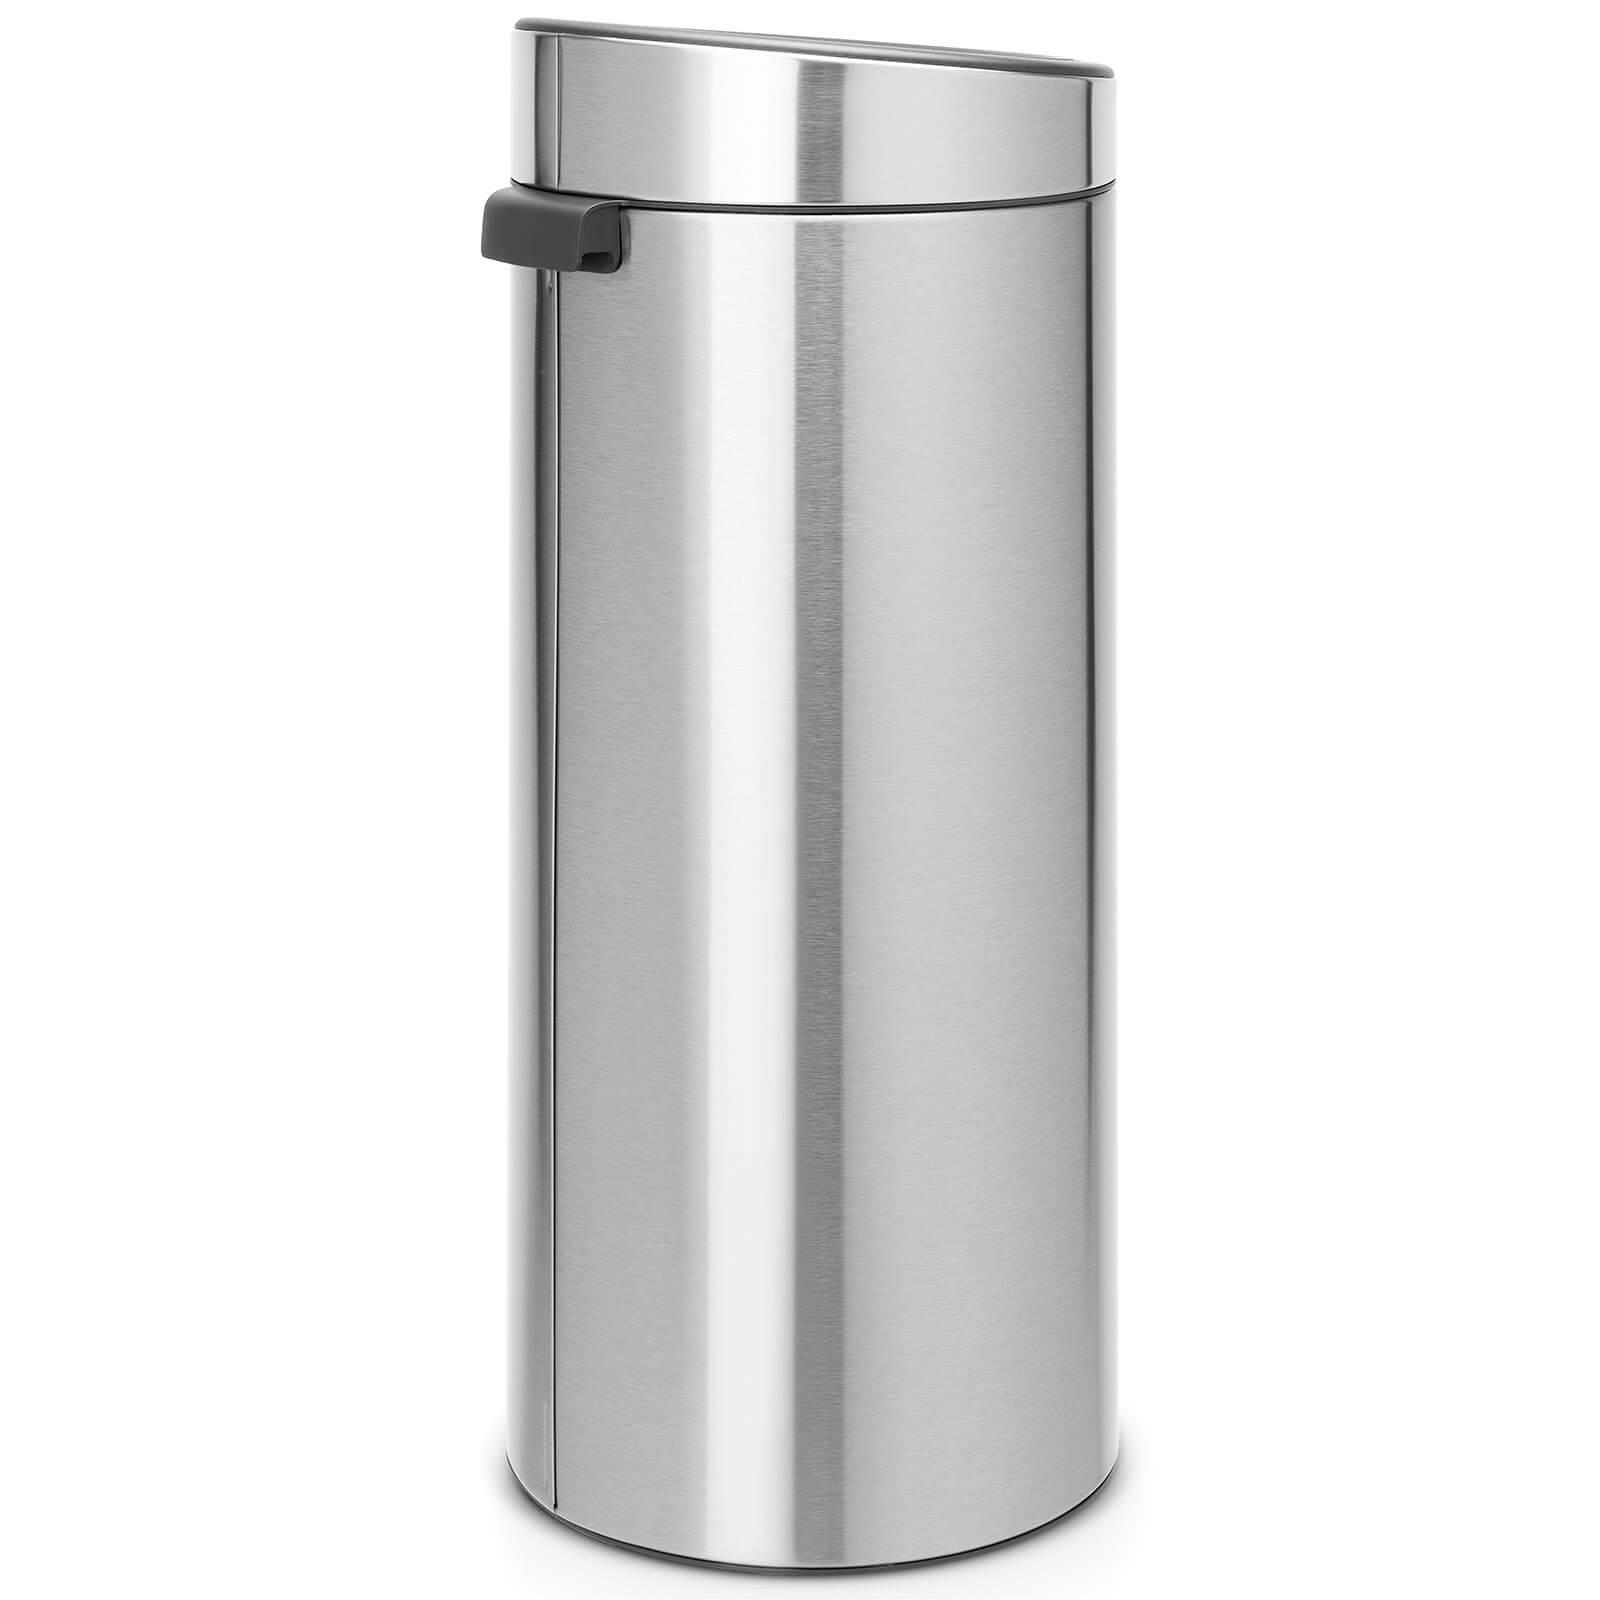 Brabantia 30 Liter Touch Bin.Brabantia 30 Litre Fingerprint Proof Touch Bin Matt Steel